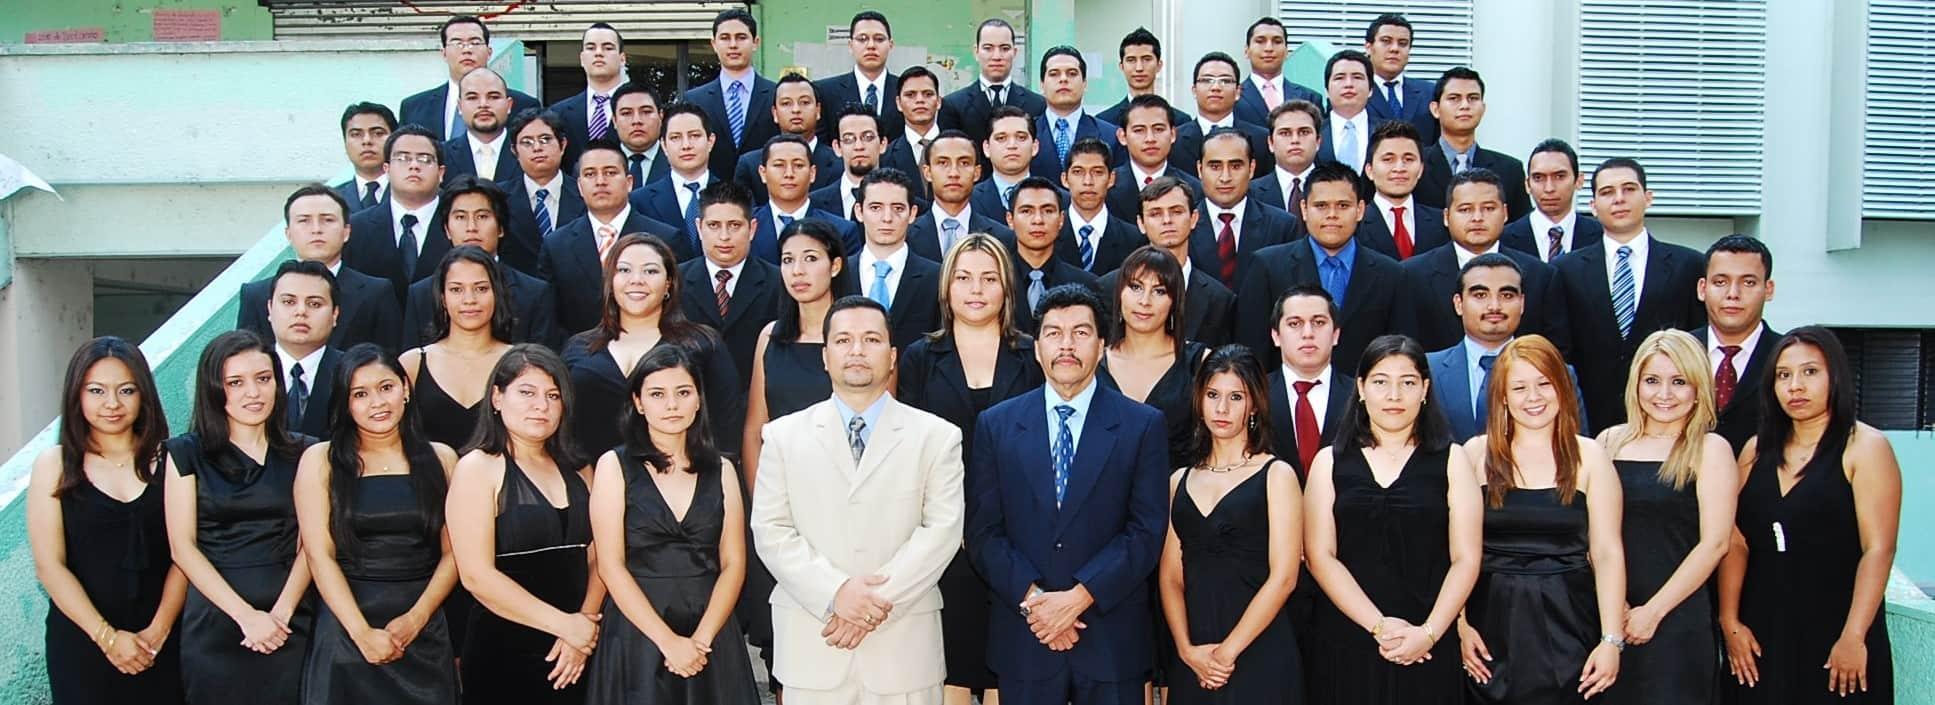 Egresados_2009